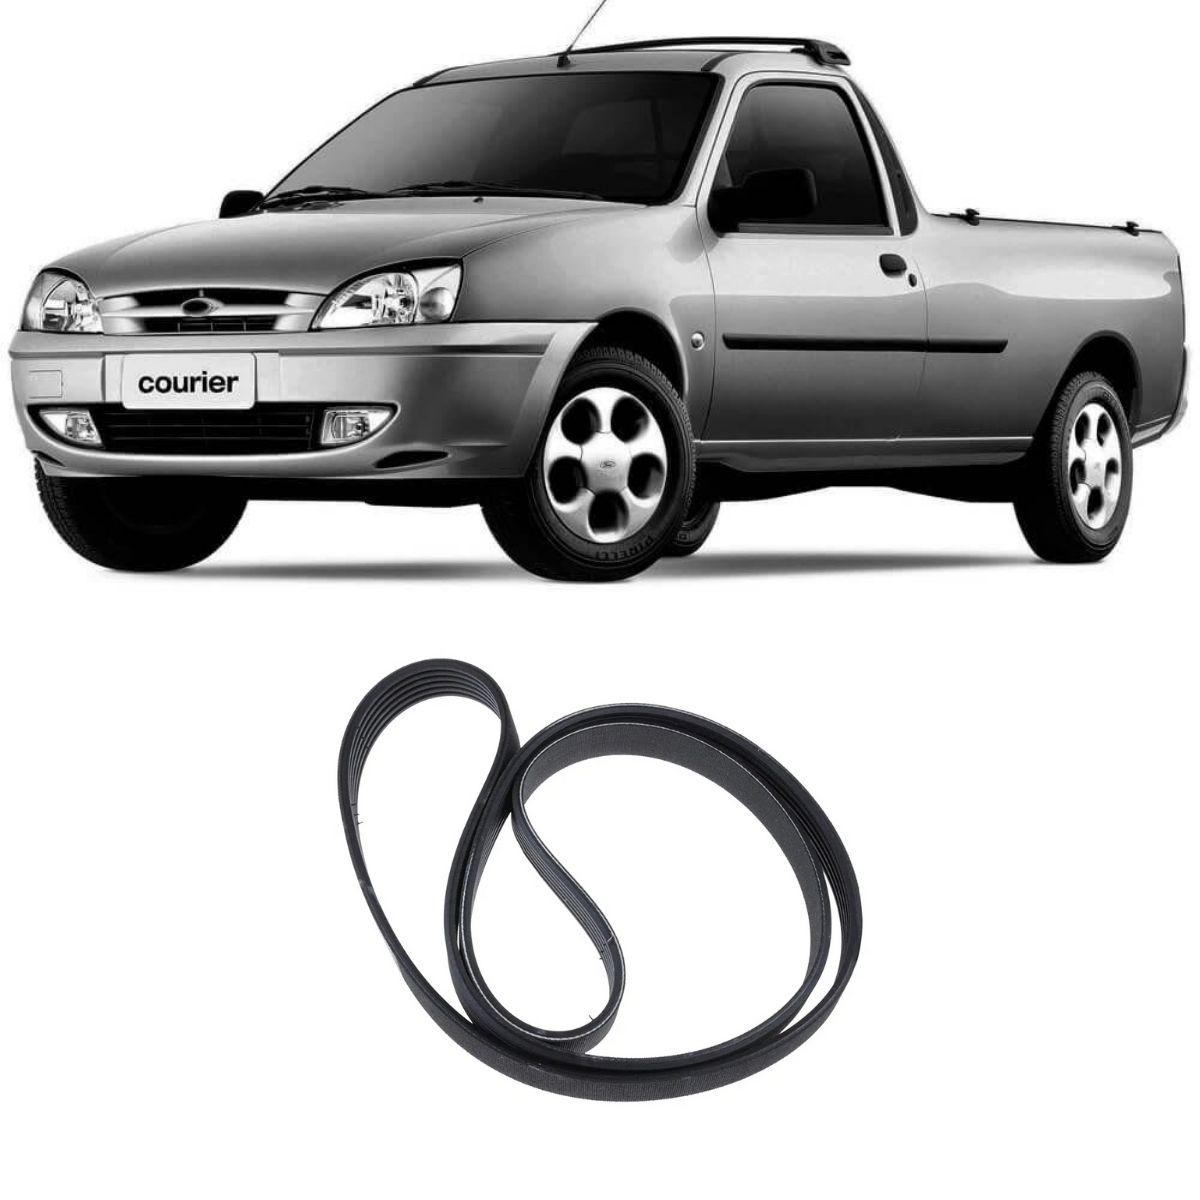 Correia Multi V Fiesta Ka 1.0 1.6 1999/ Courier 1999/2002